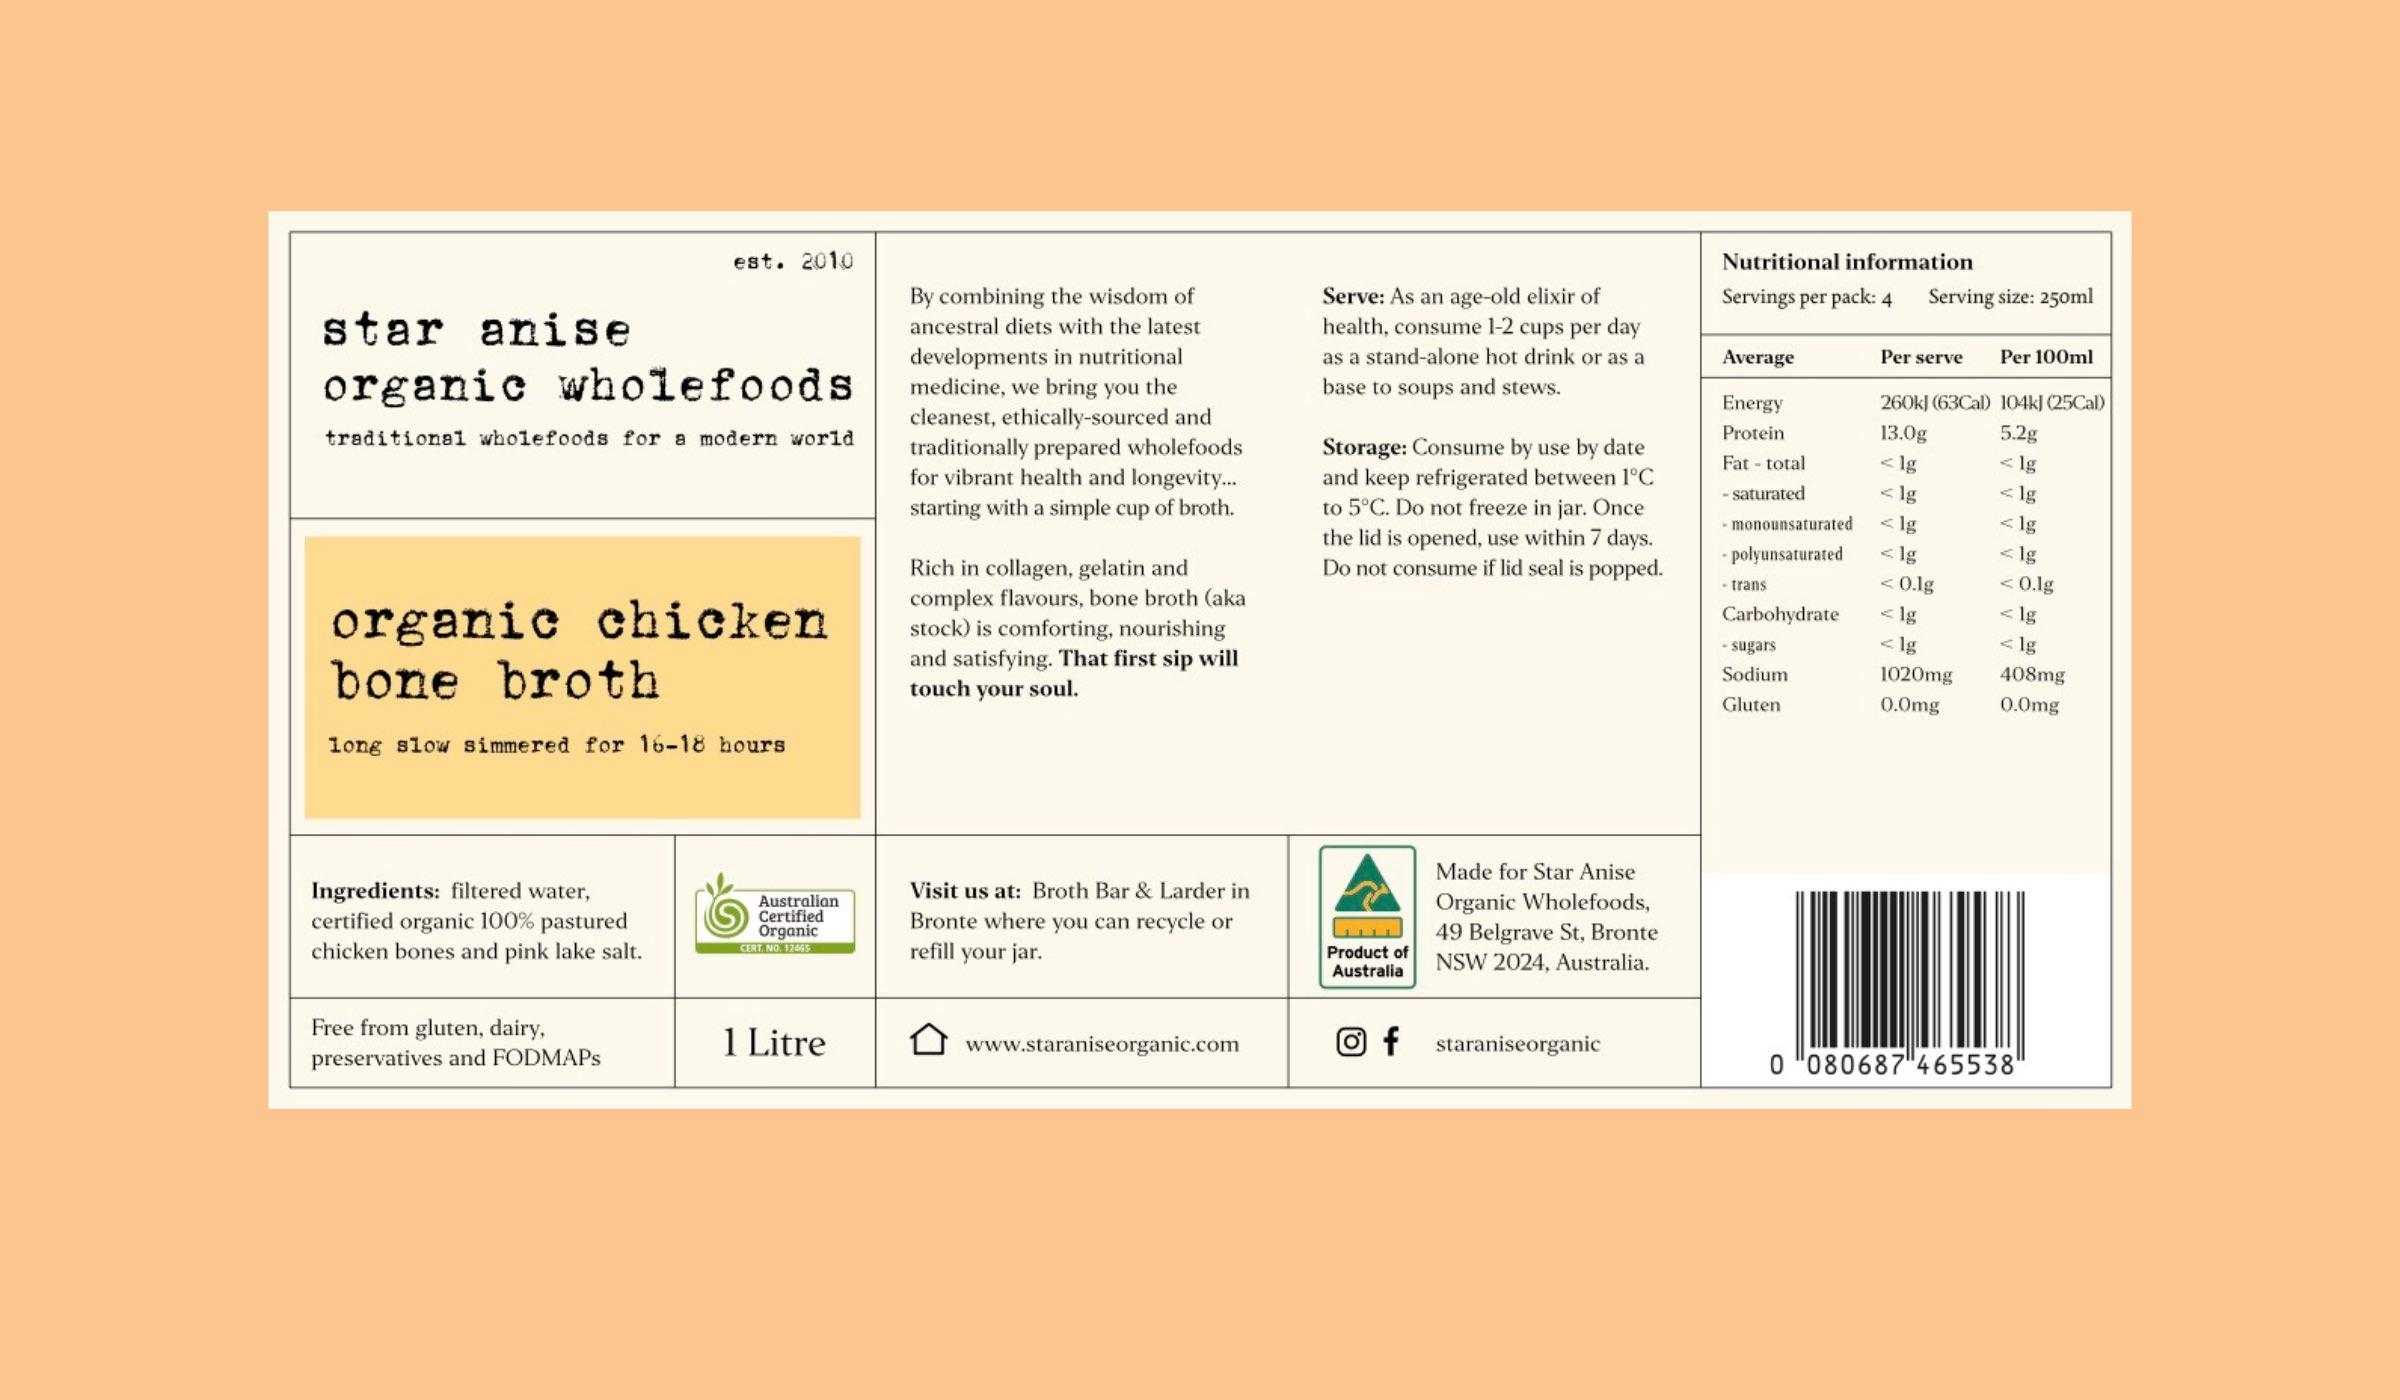 Star Anise Organics label design